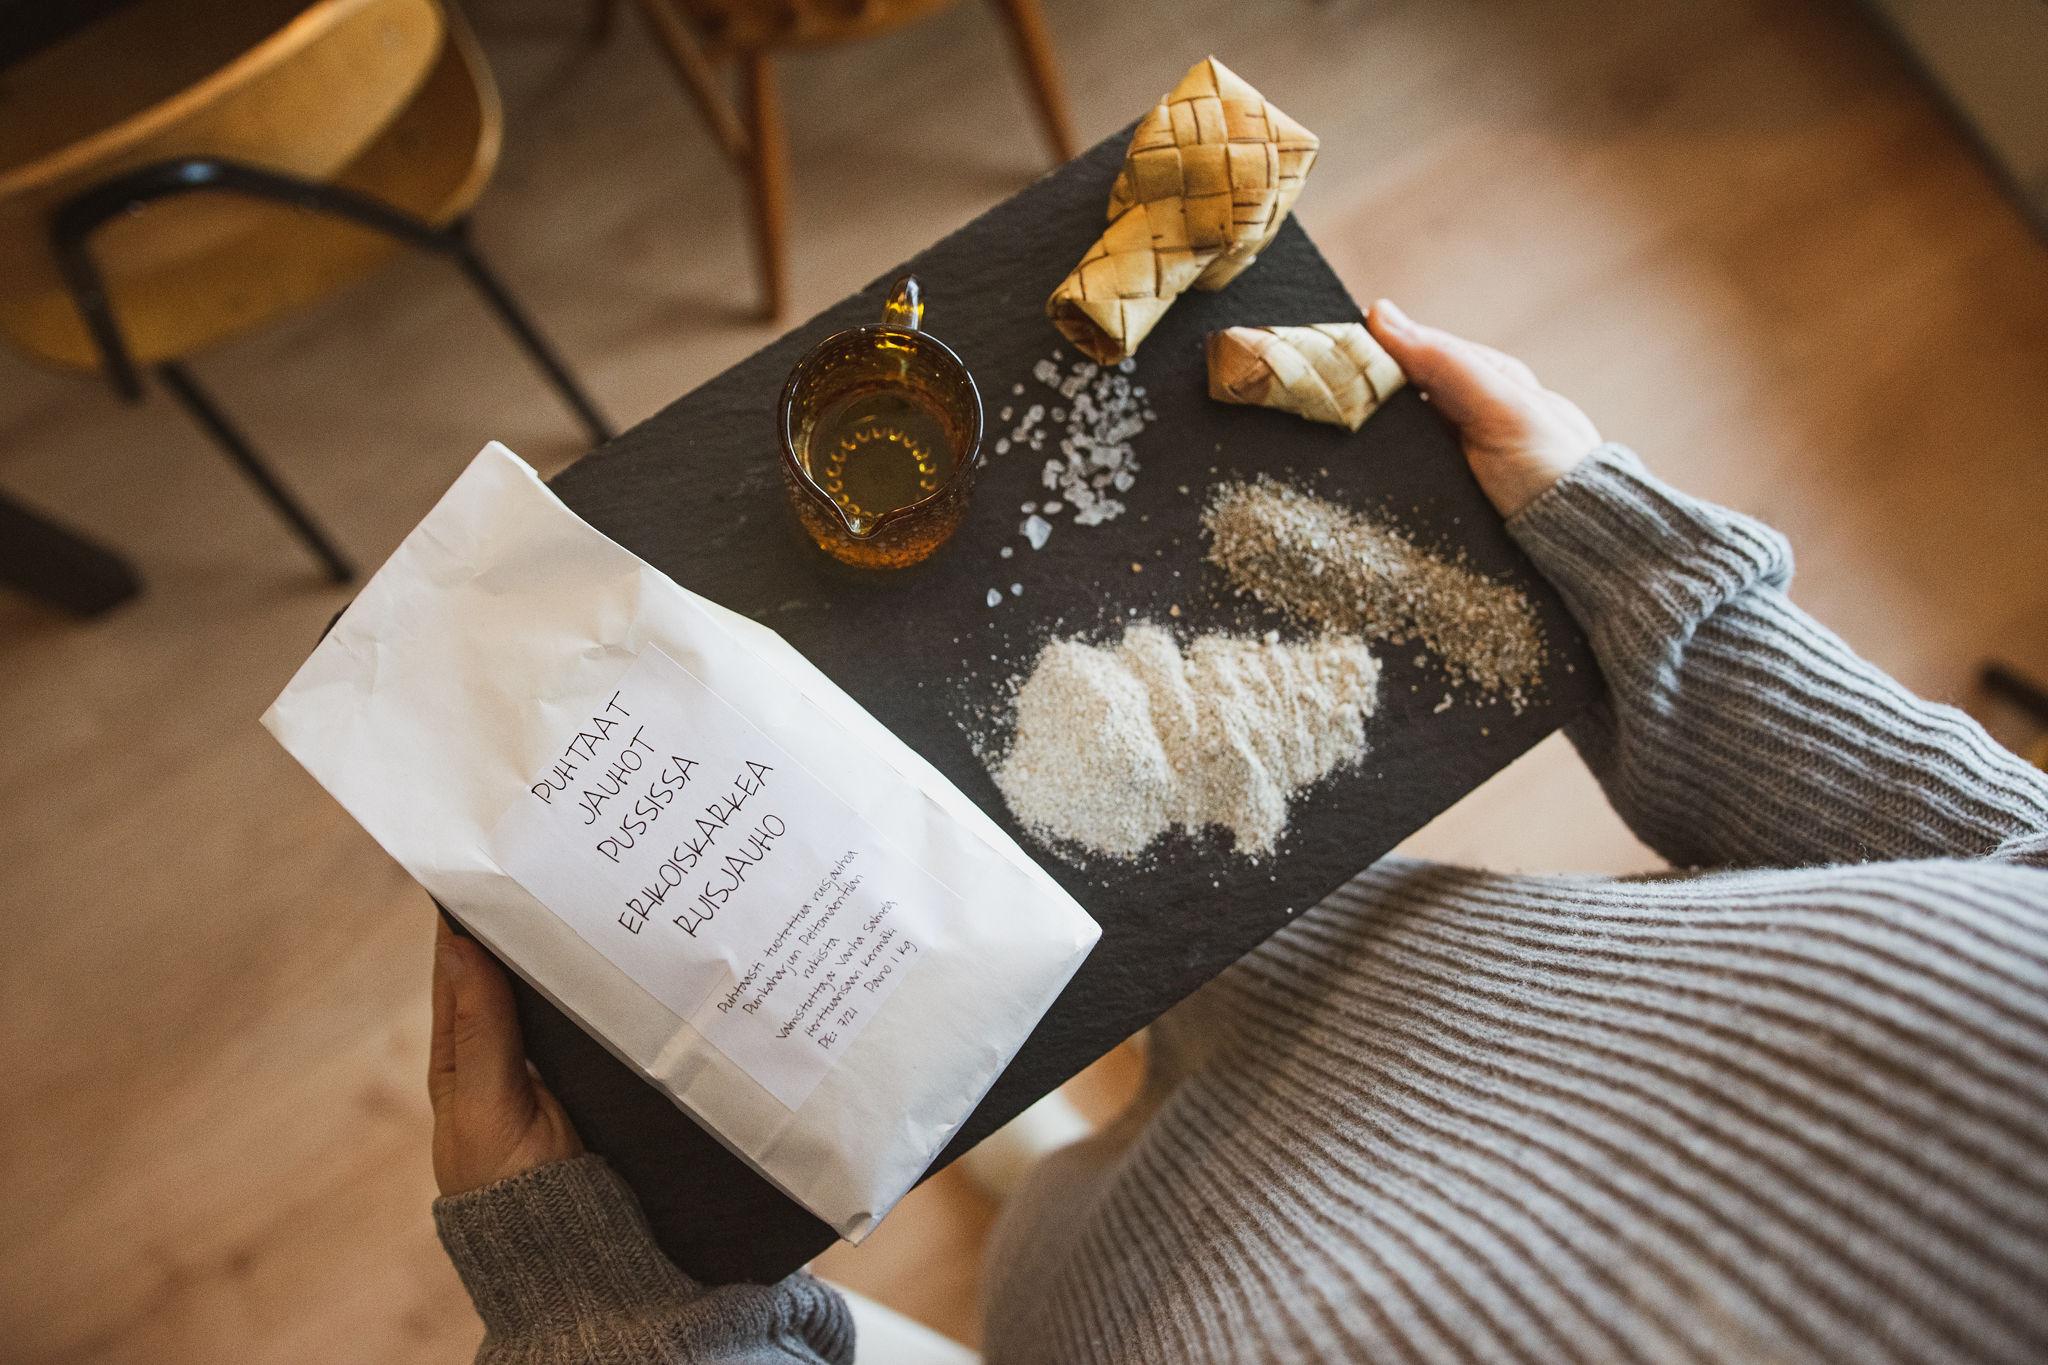 Ingredients of simple finnish rye cracker recipe, näkkäri